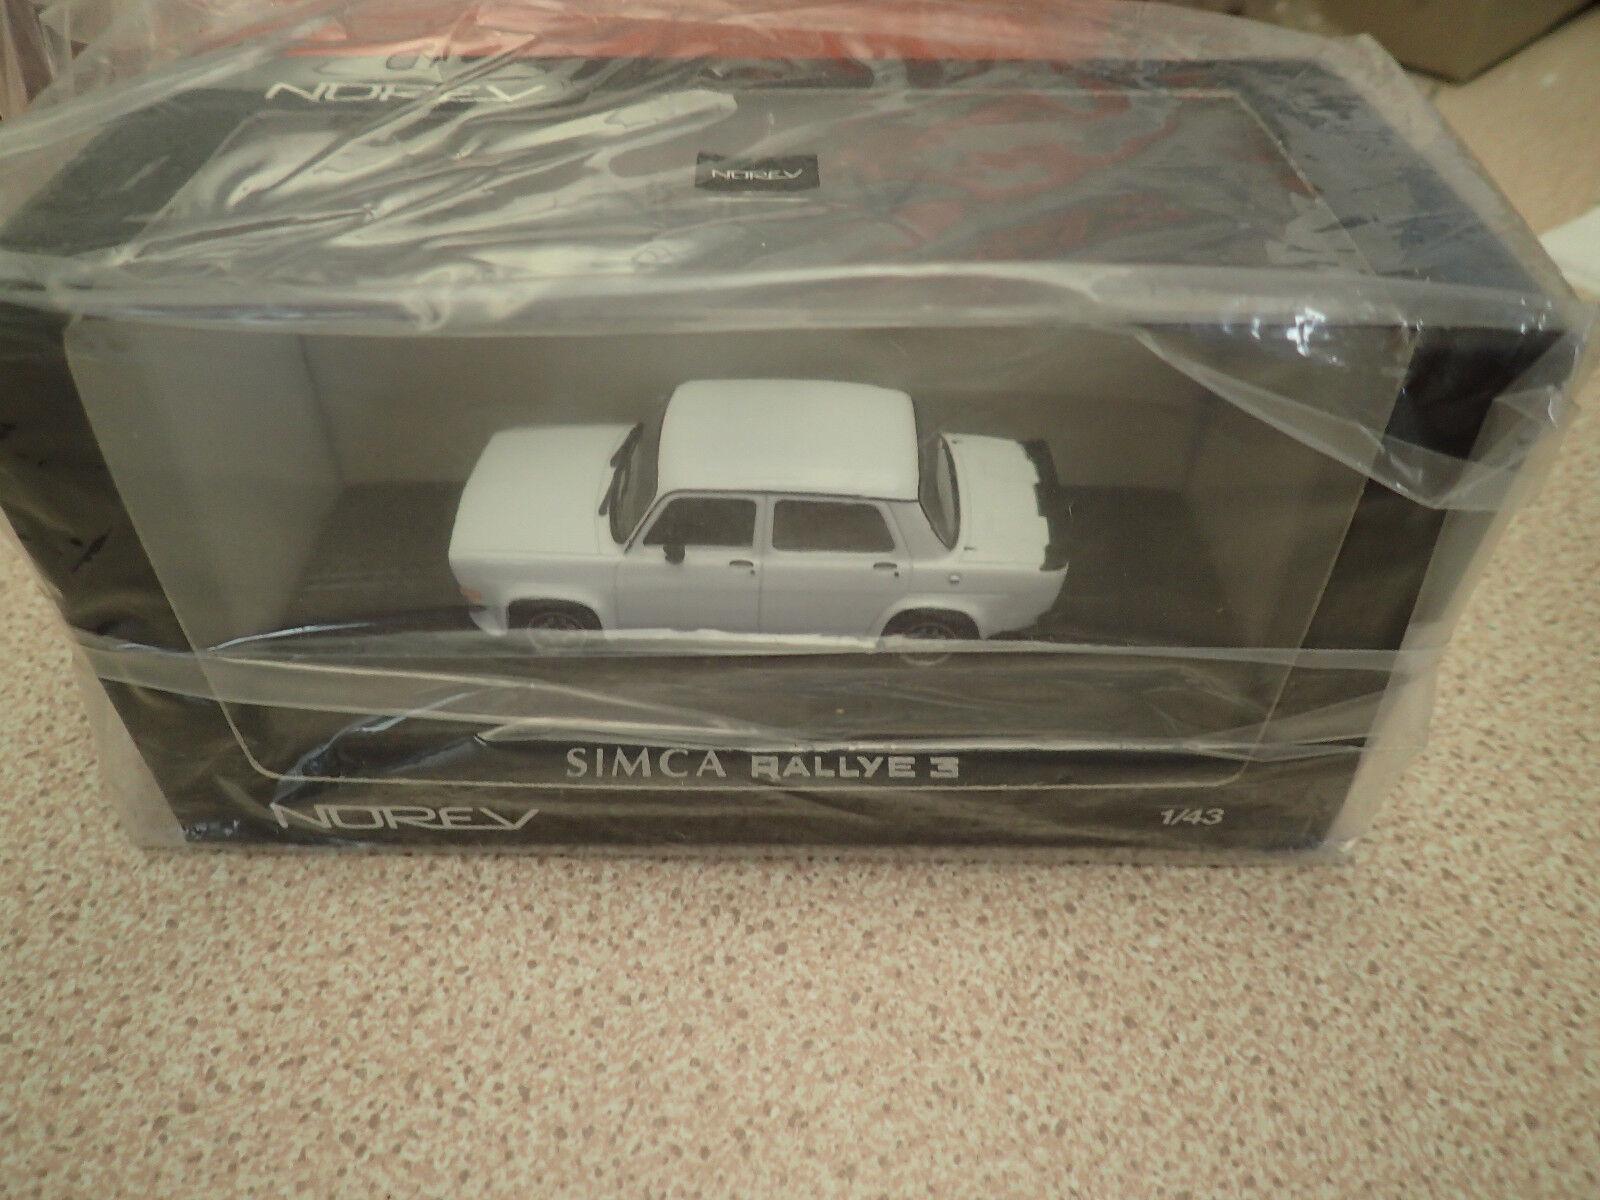 NOREV 571017 Simca 1000 Rallye 3 White Factory Sealed